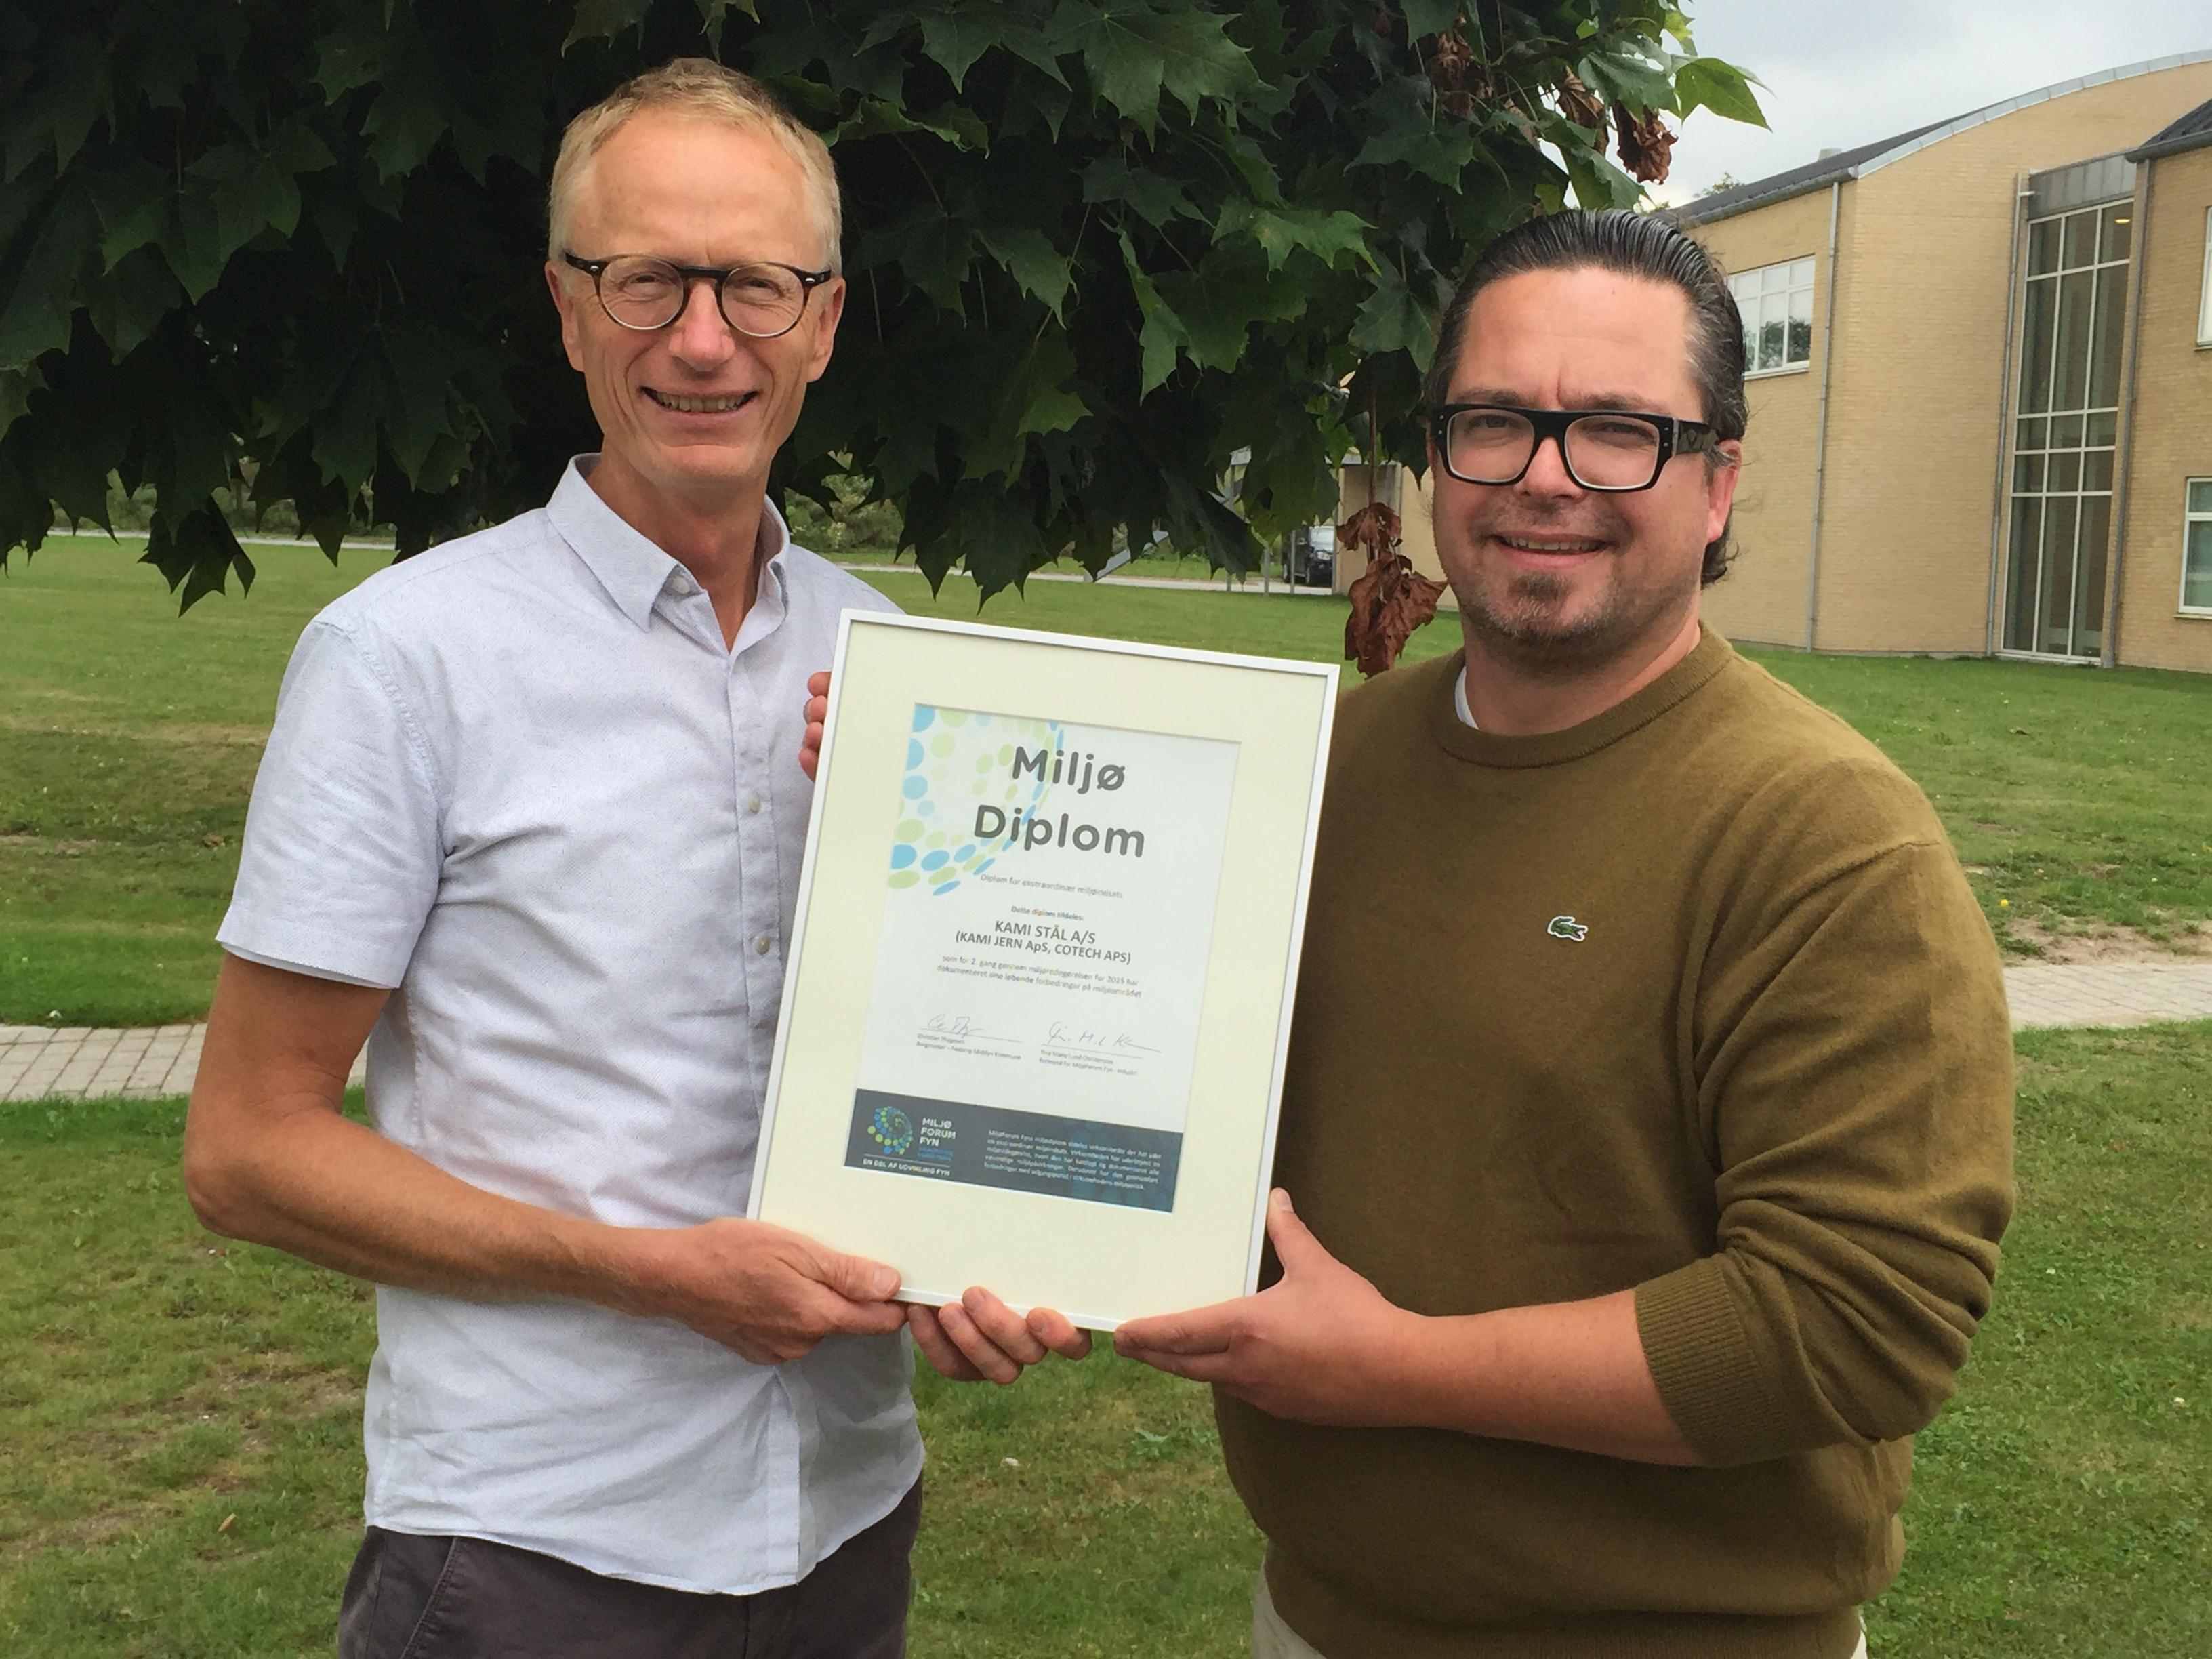 Miljø Diplom 2016 - KAMI og Cotech